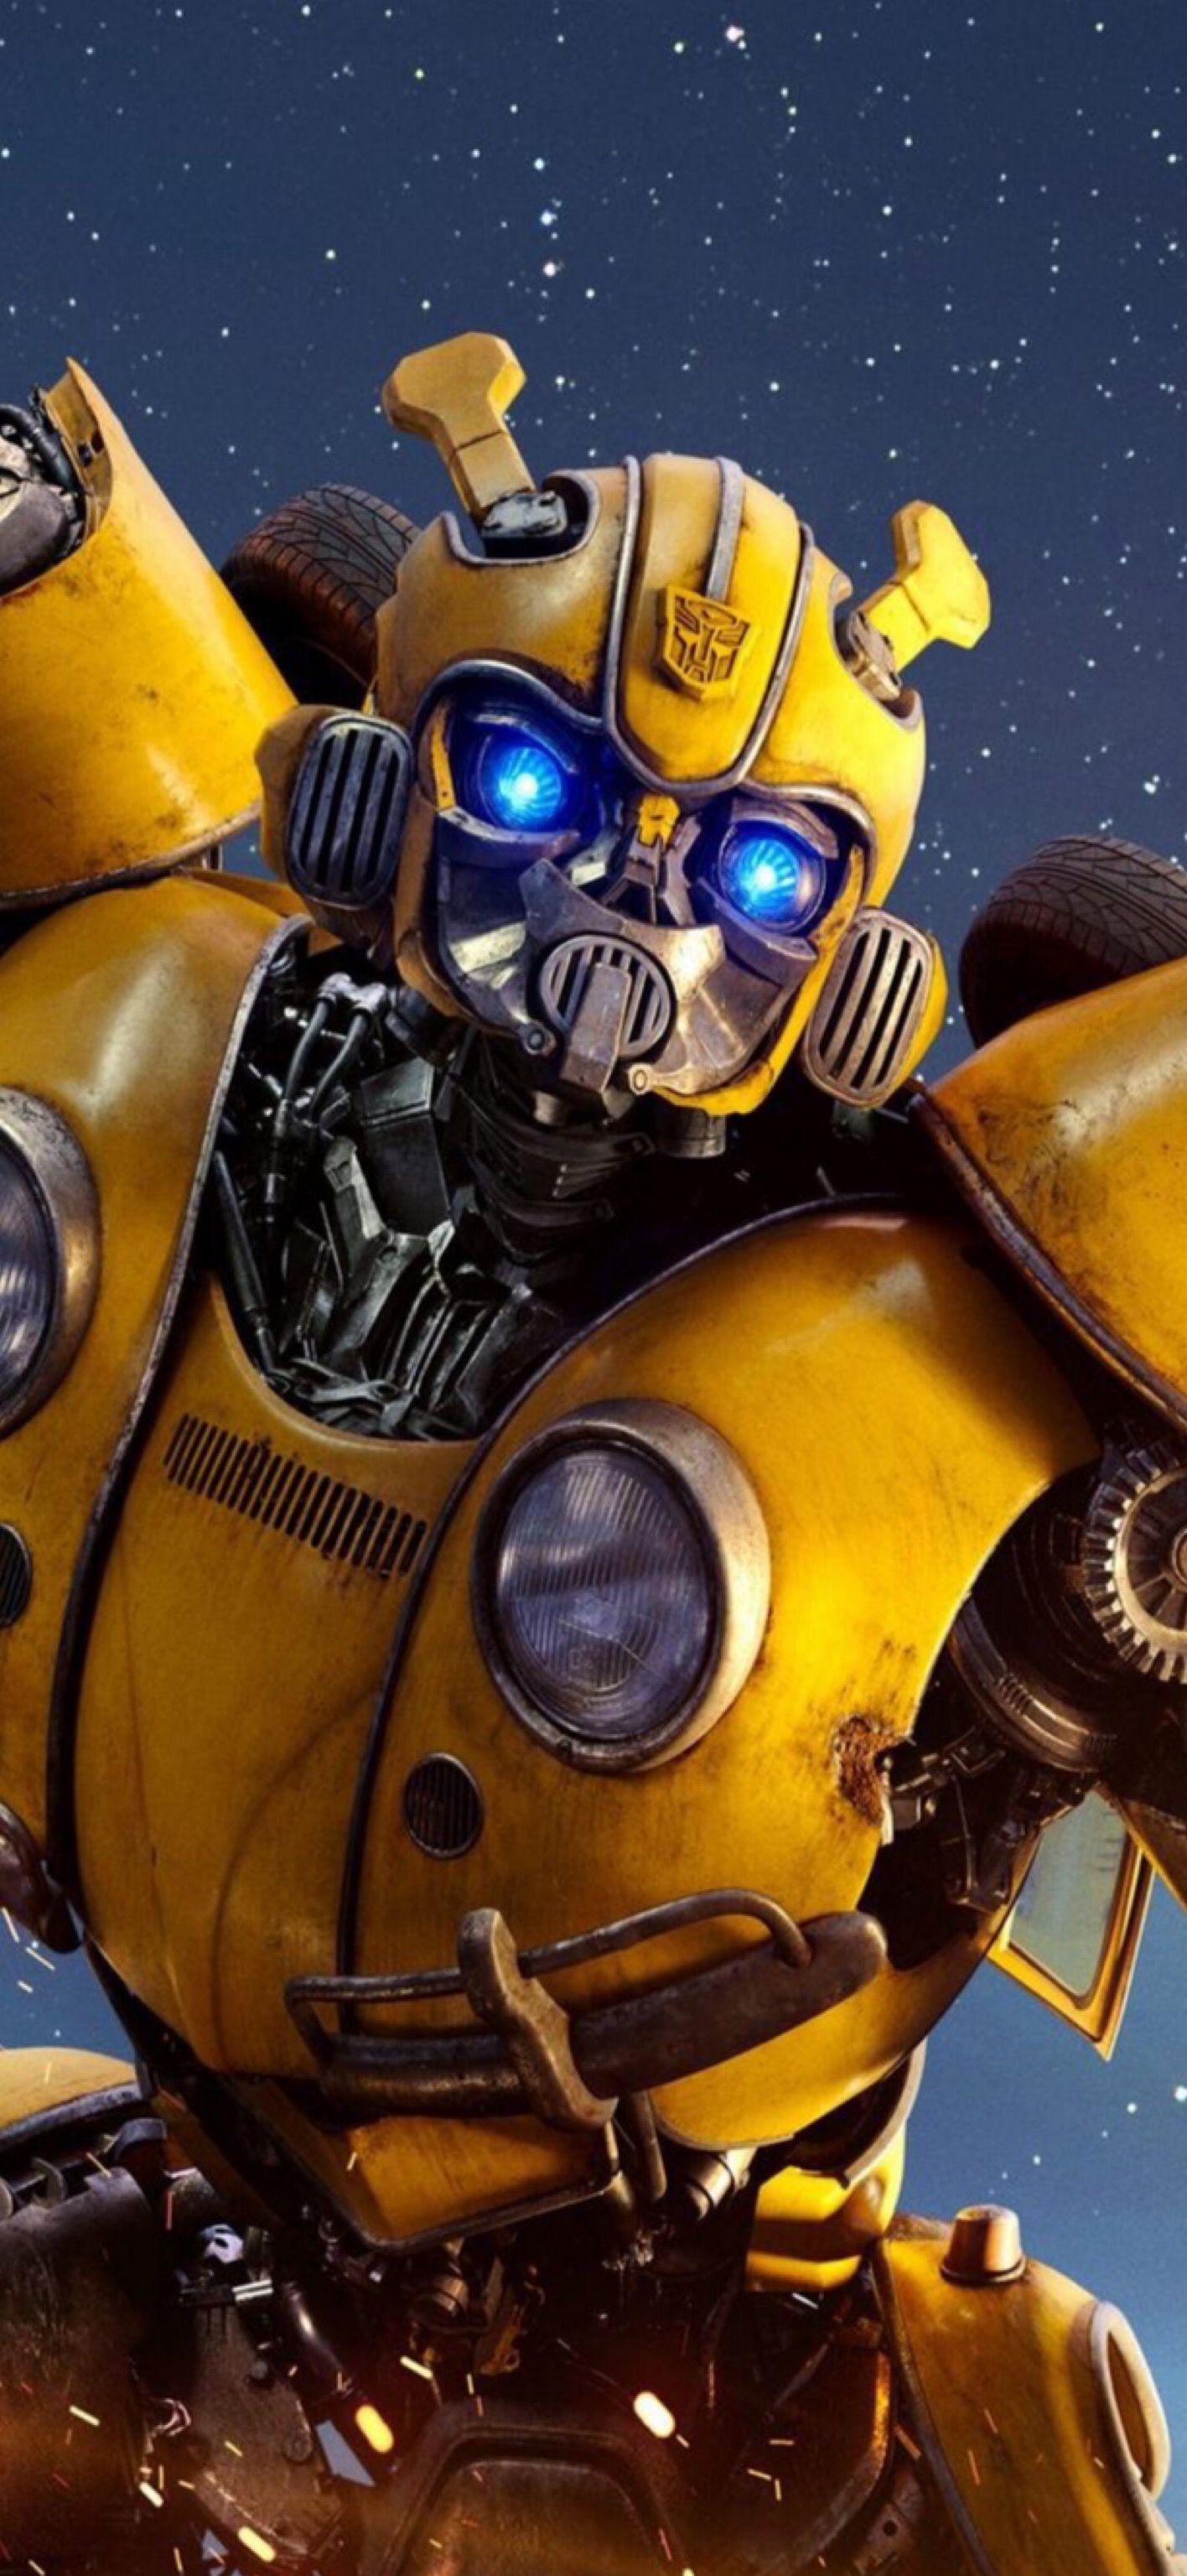 Wallpaper transformer bumblebee resized for iphone x - Transformers bumblebee car wallpaper ...